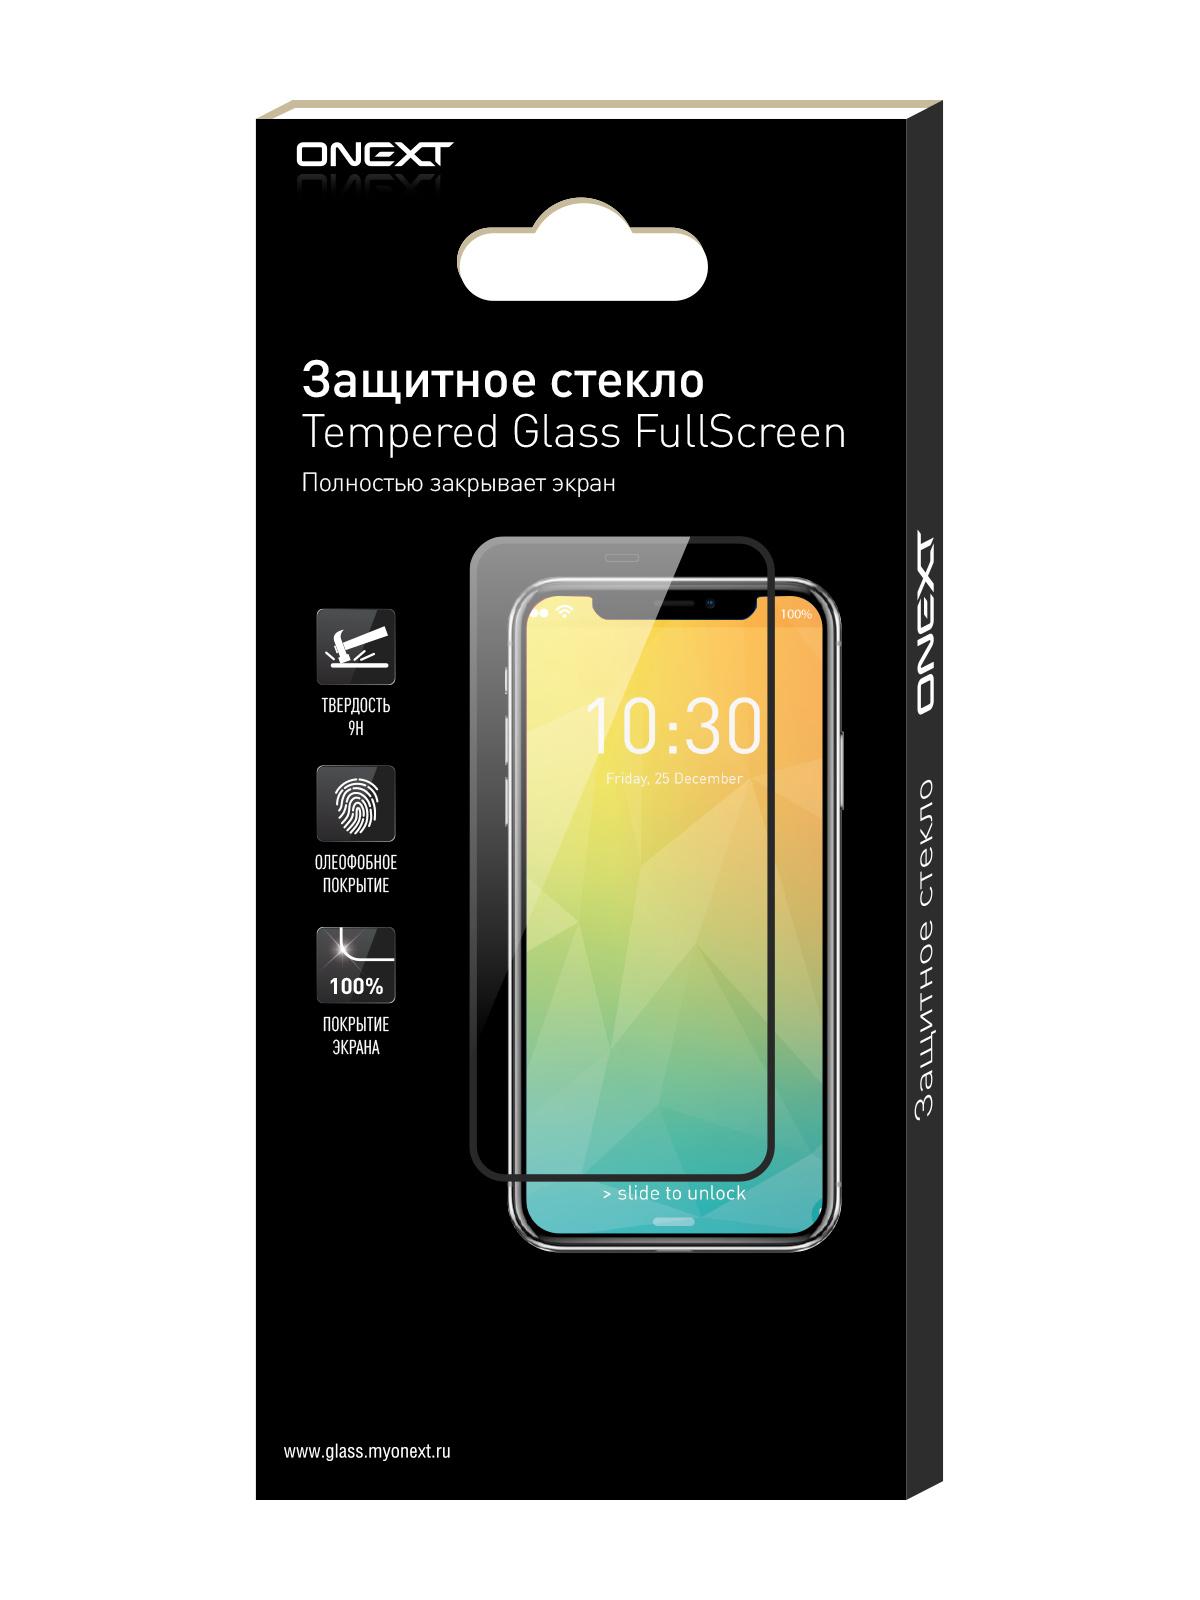 Защитное стекло ONEXT для Xiaomi Redmi 4X Gold